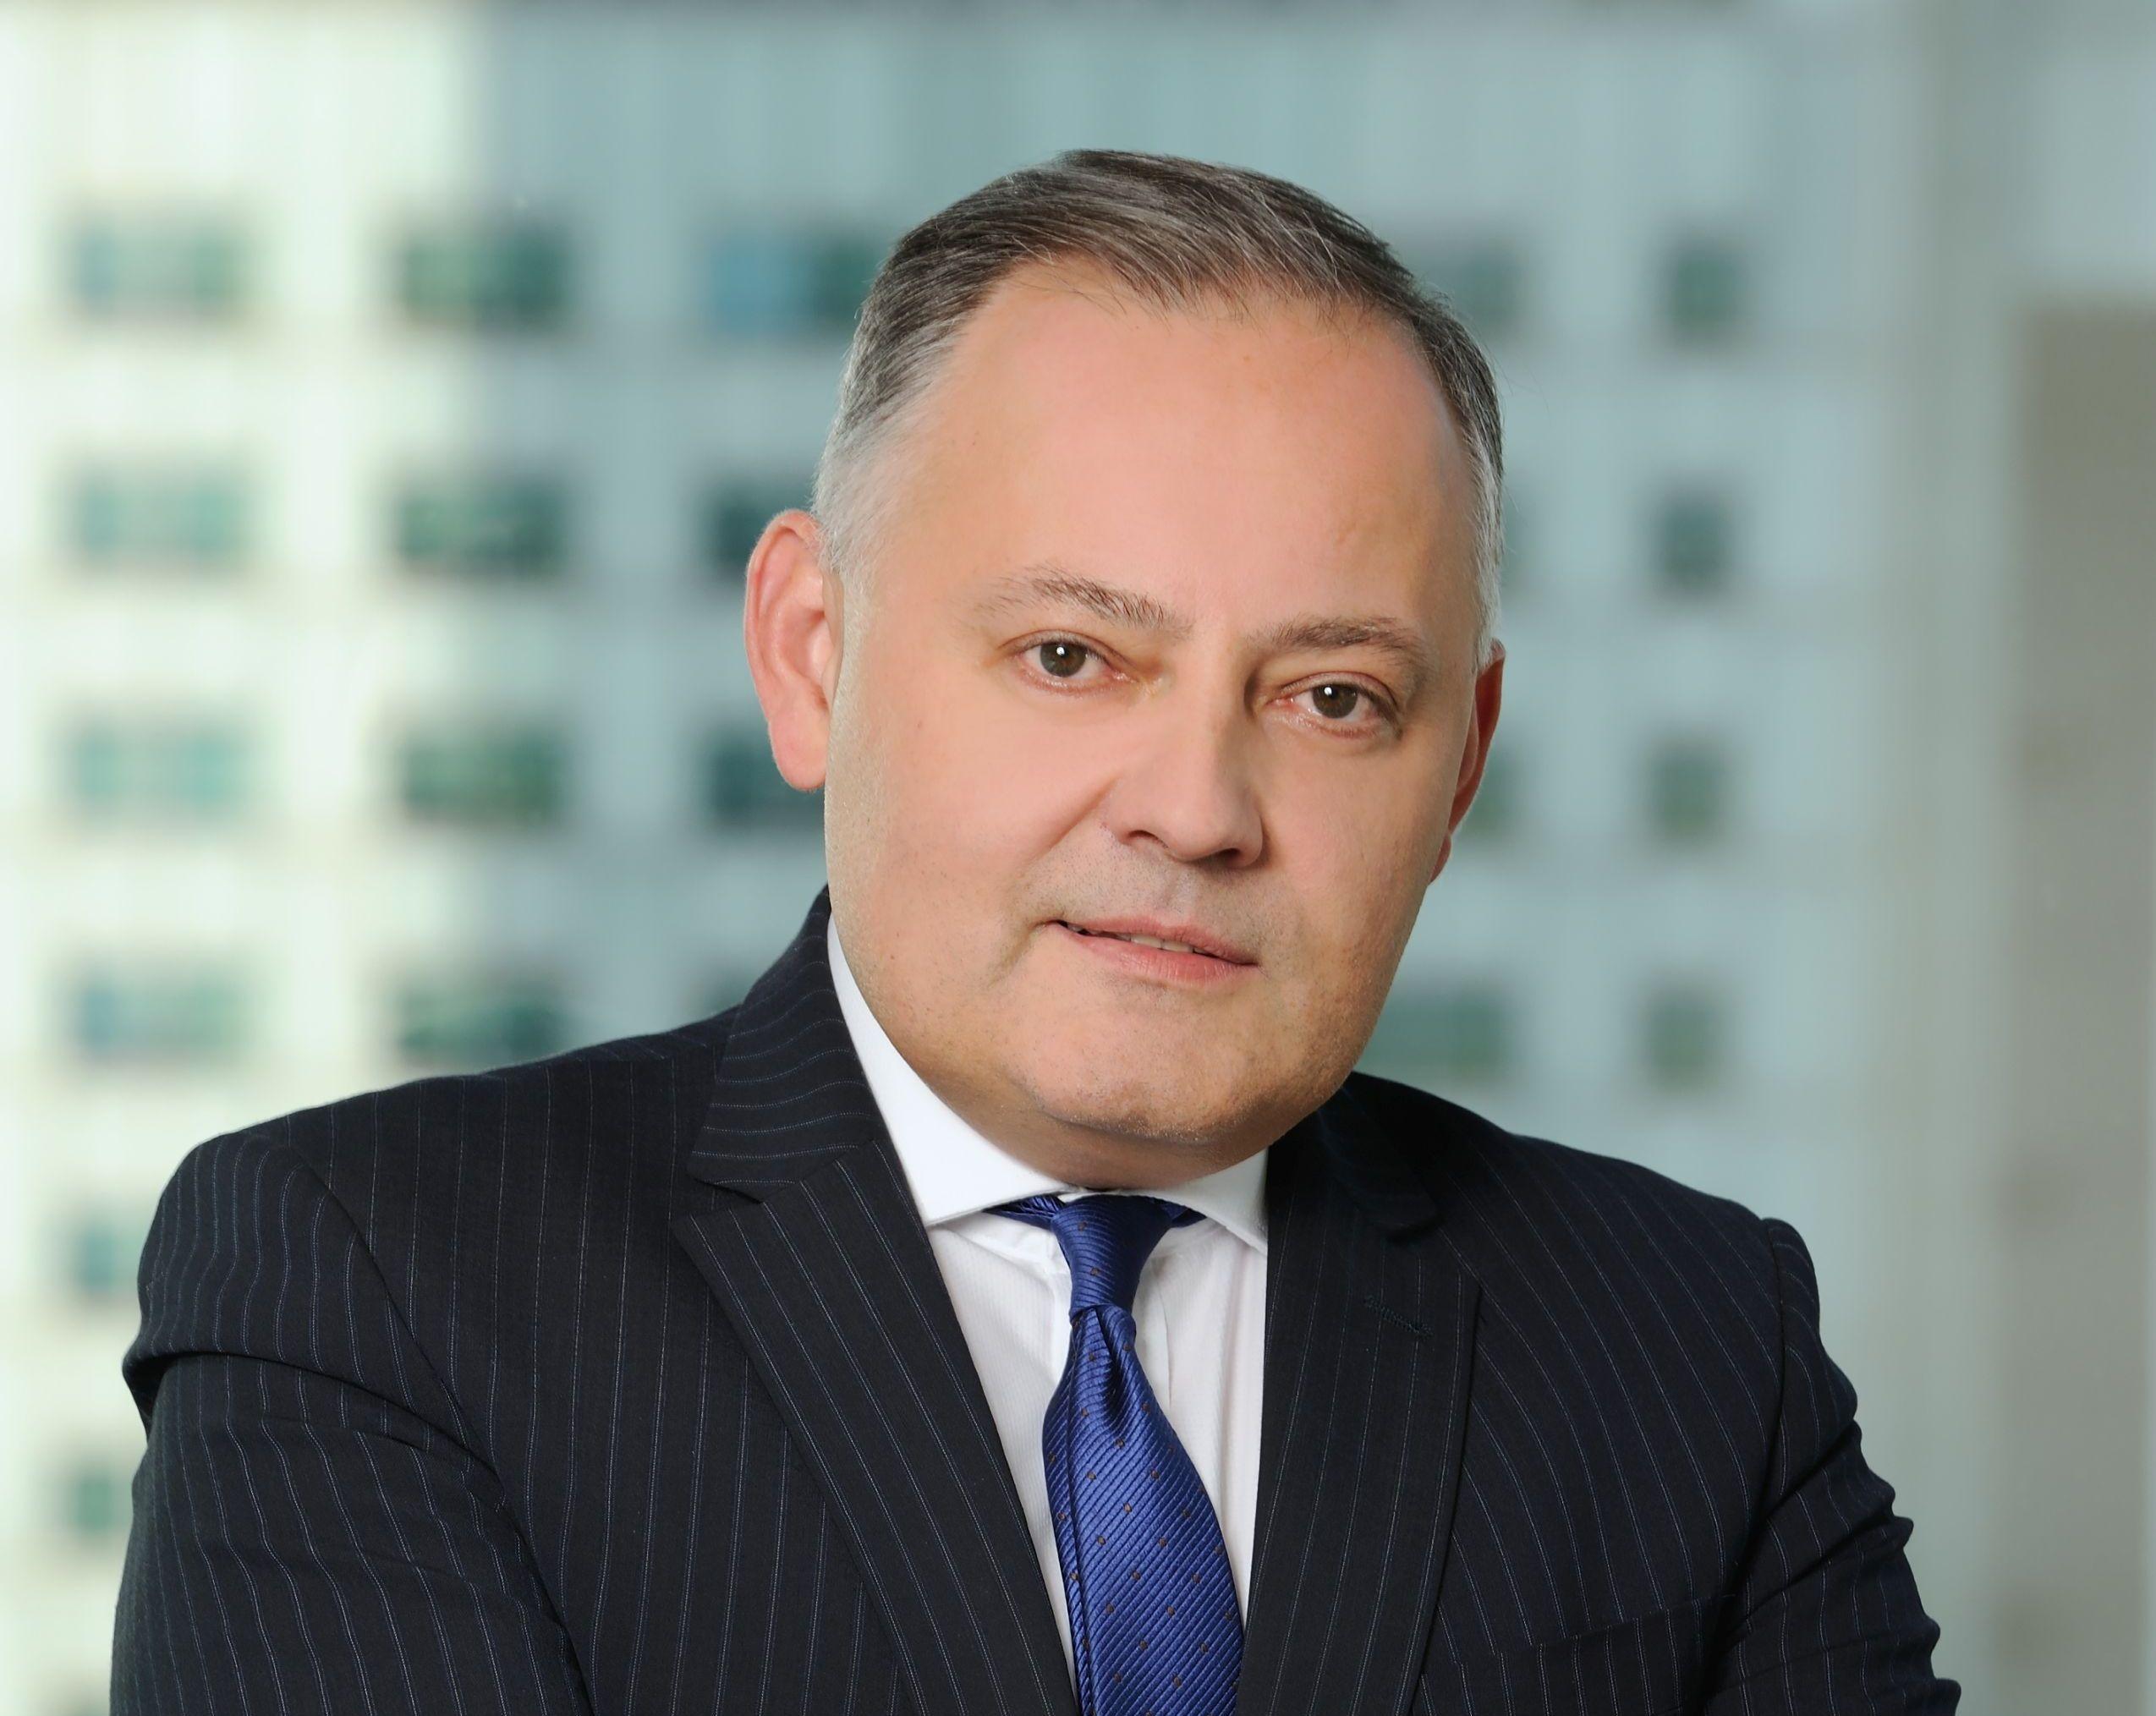 Wojciech Dąbrowski, prezes zarządu PGE (Fot. mat. pras. PGE).